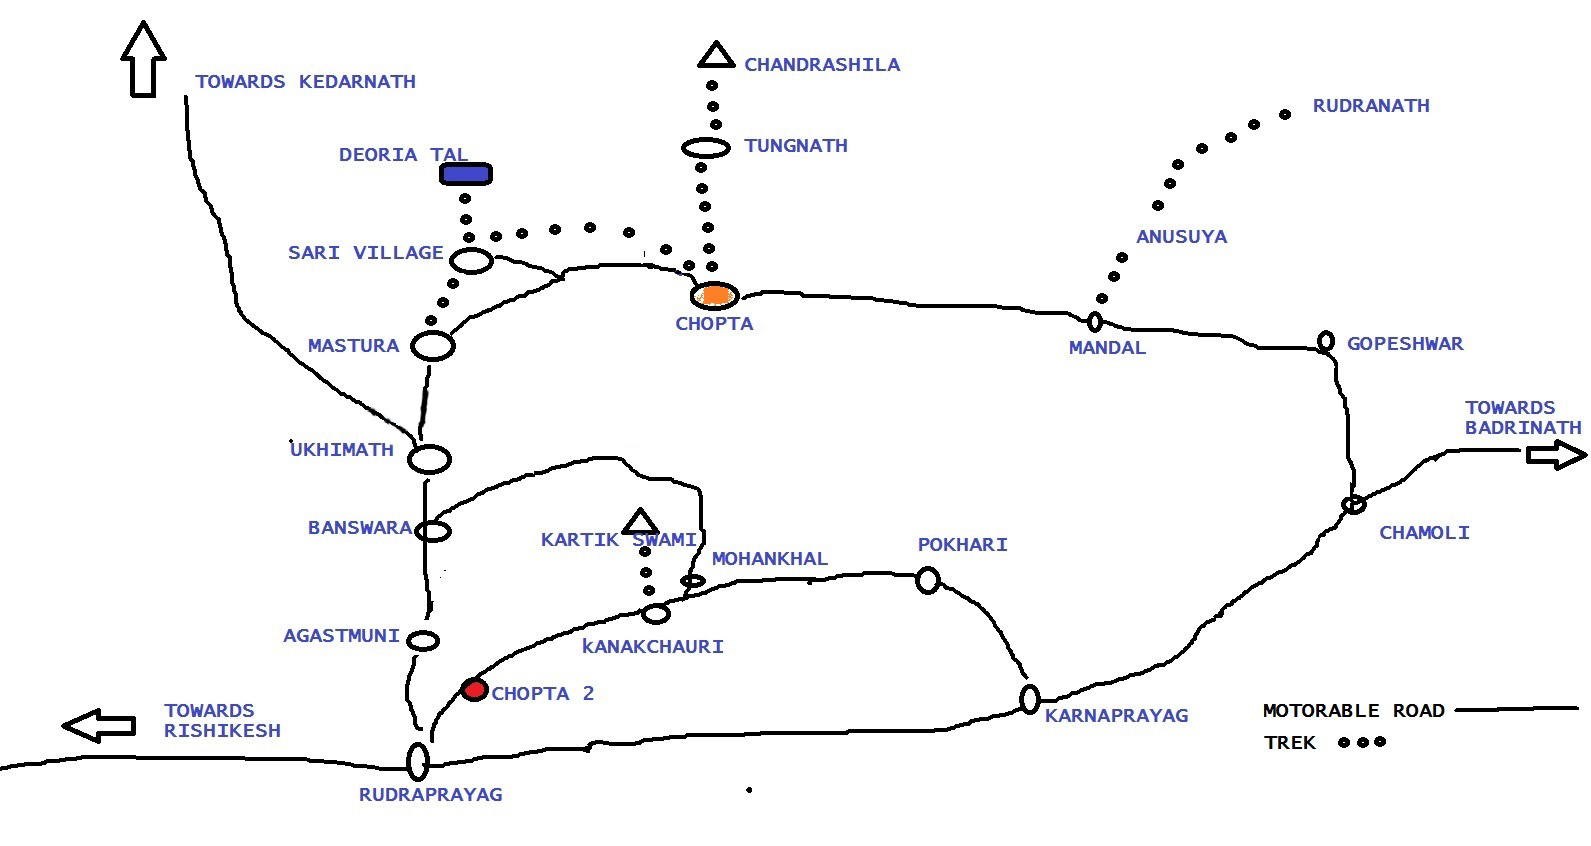 chopta-tungnath-deoria-tal-kartik-swamy-trek-map